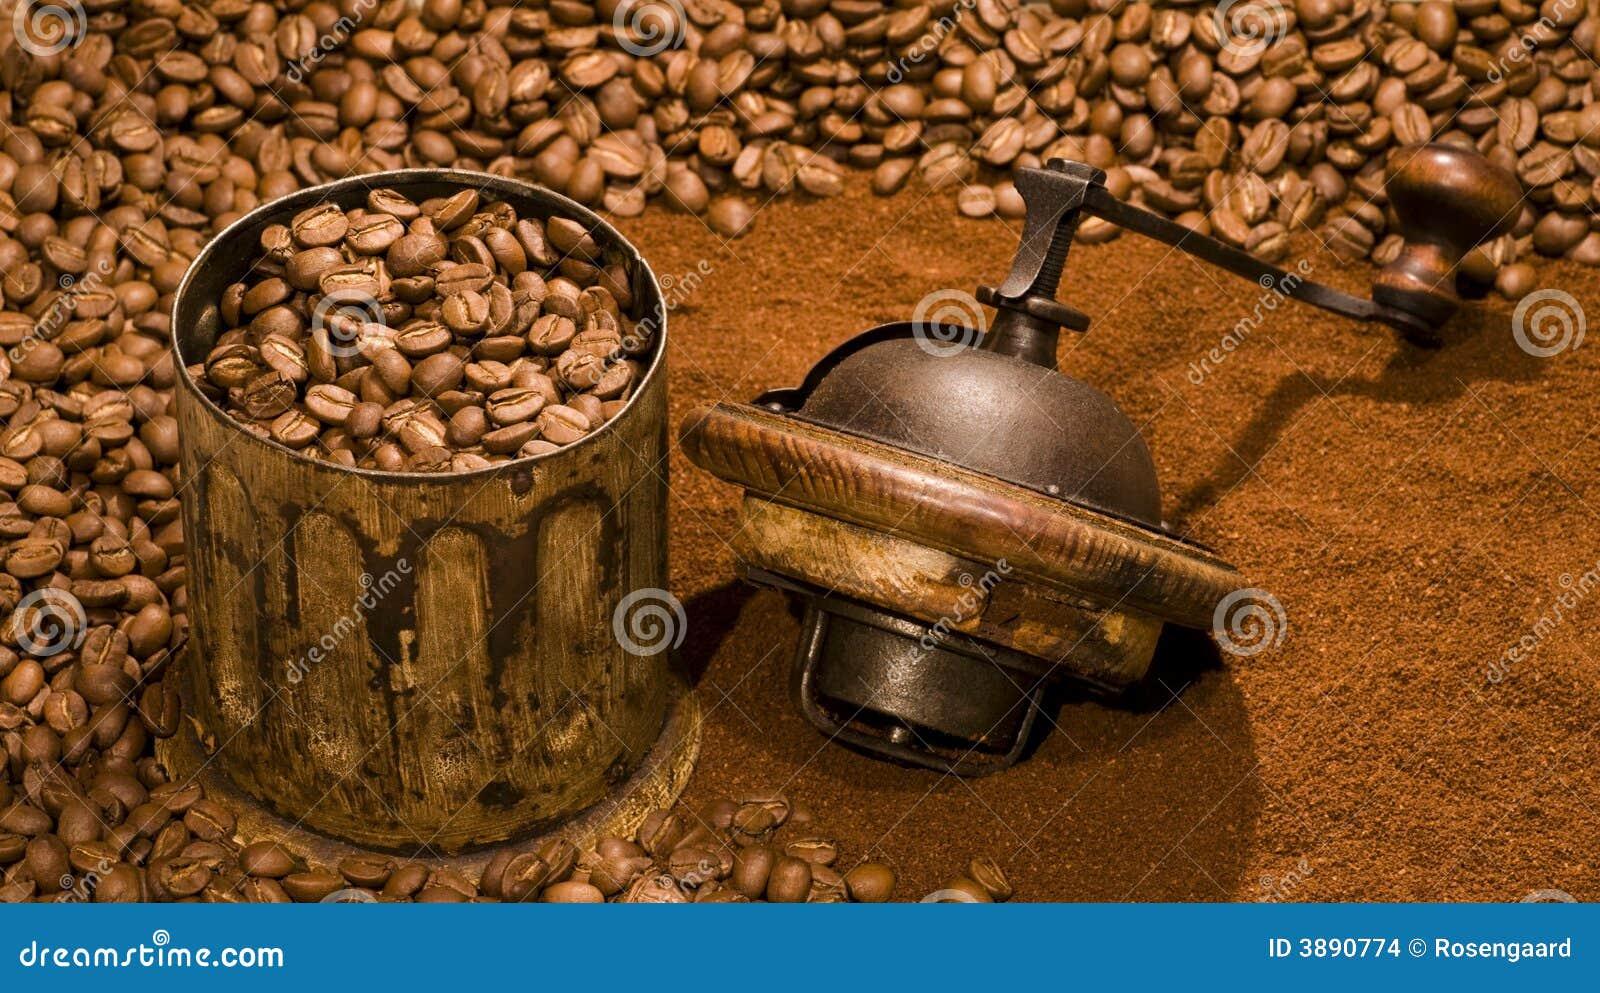 Laminatoio di caffè e chicchi di caffè